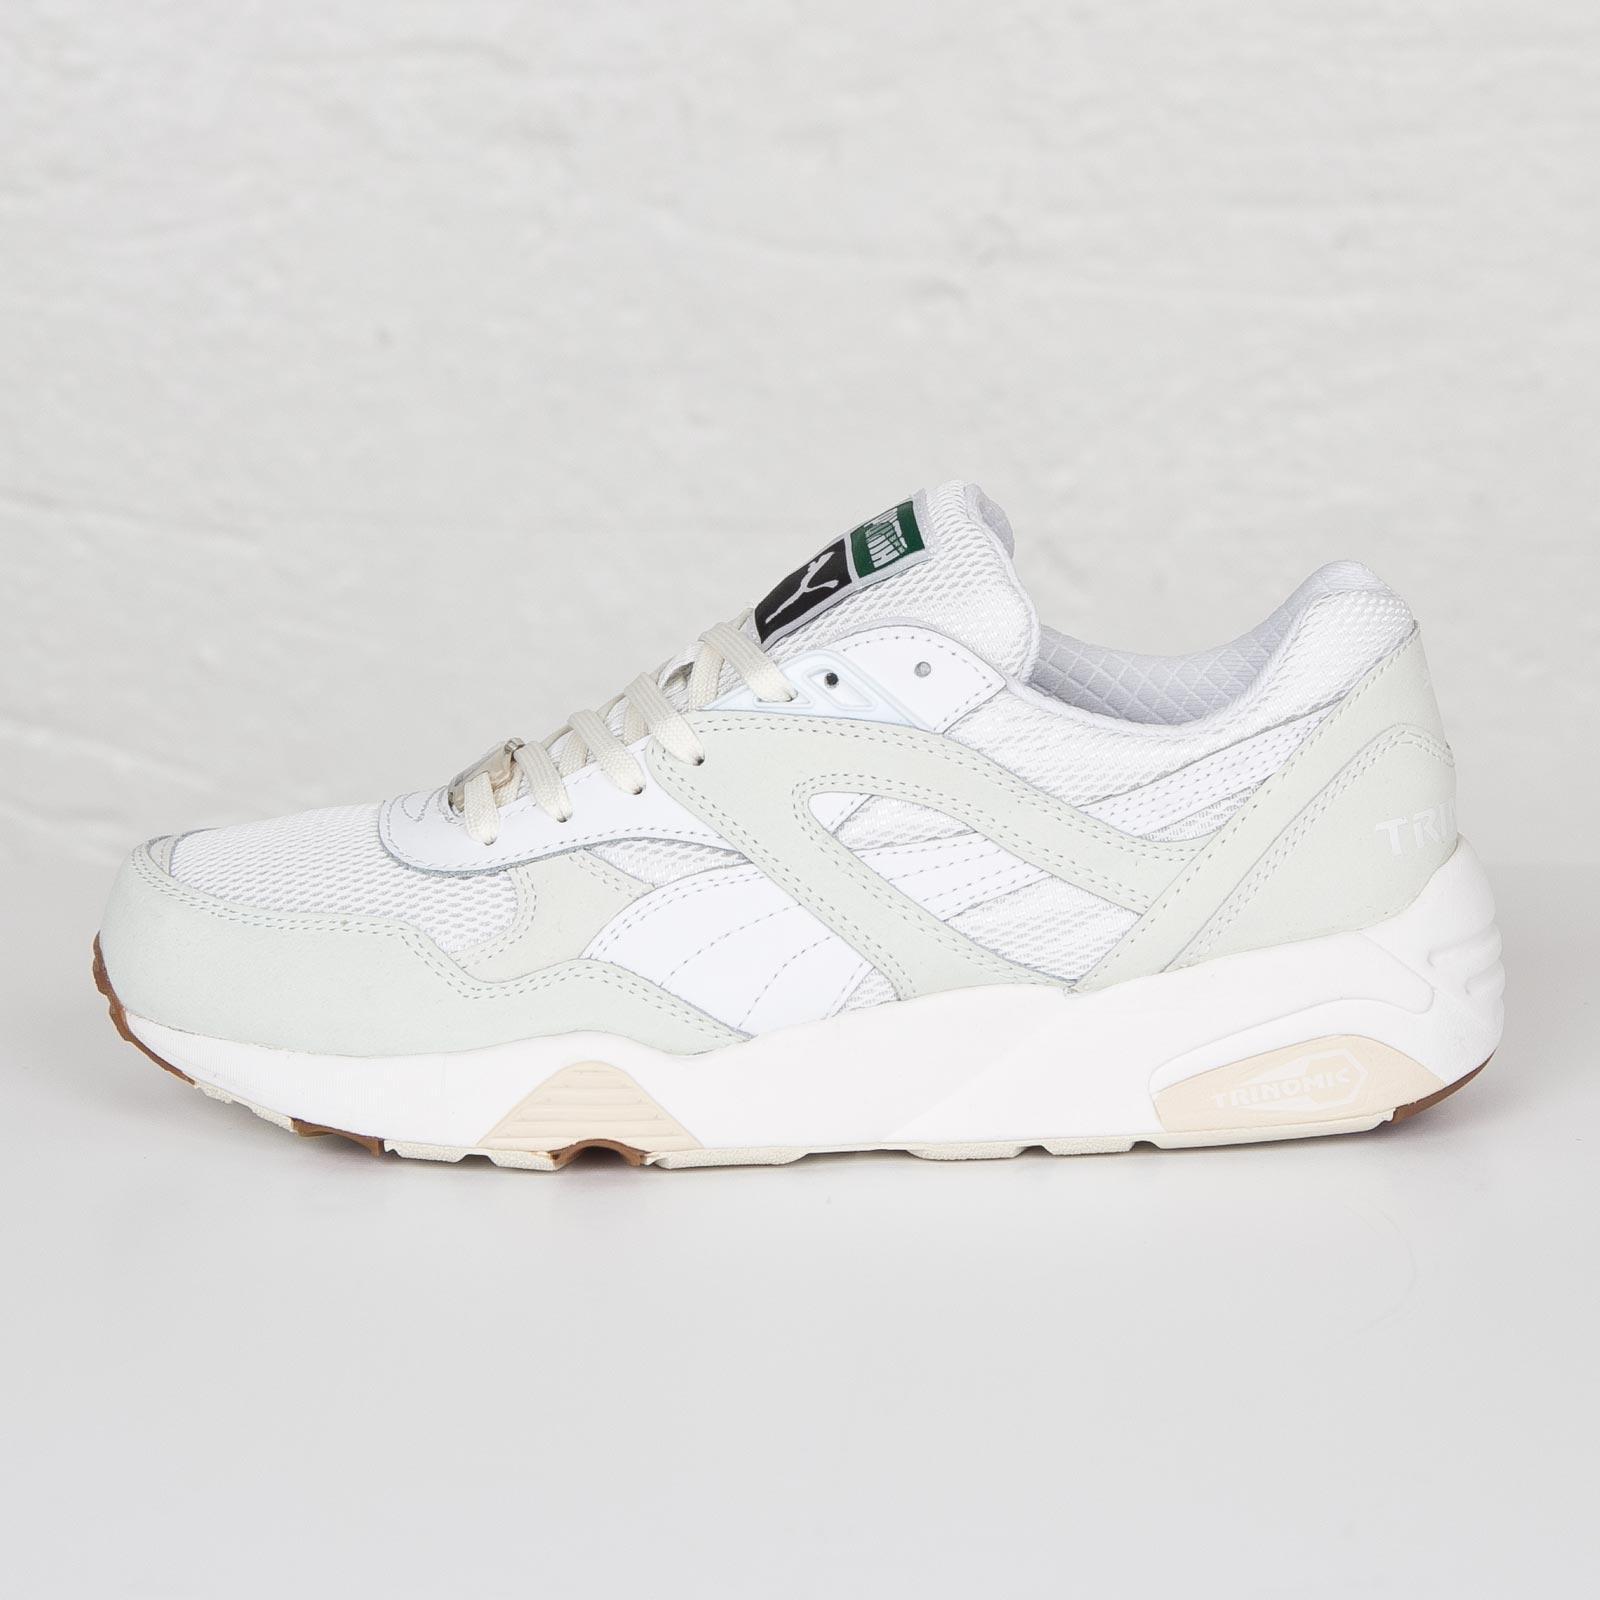 Puma R698 White On White - 358142-01 - Sneakersnstuff  de514af6d